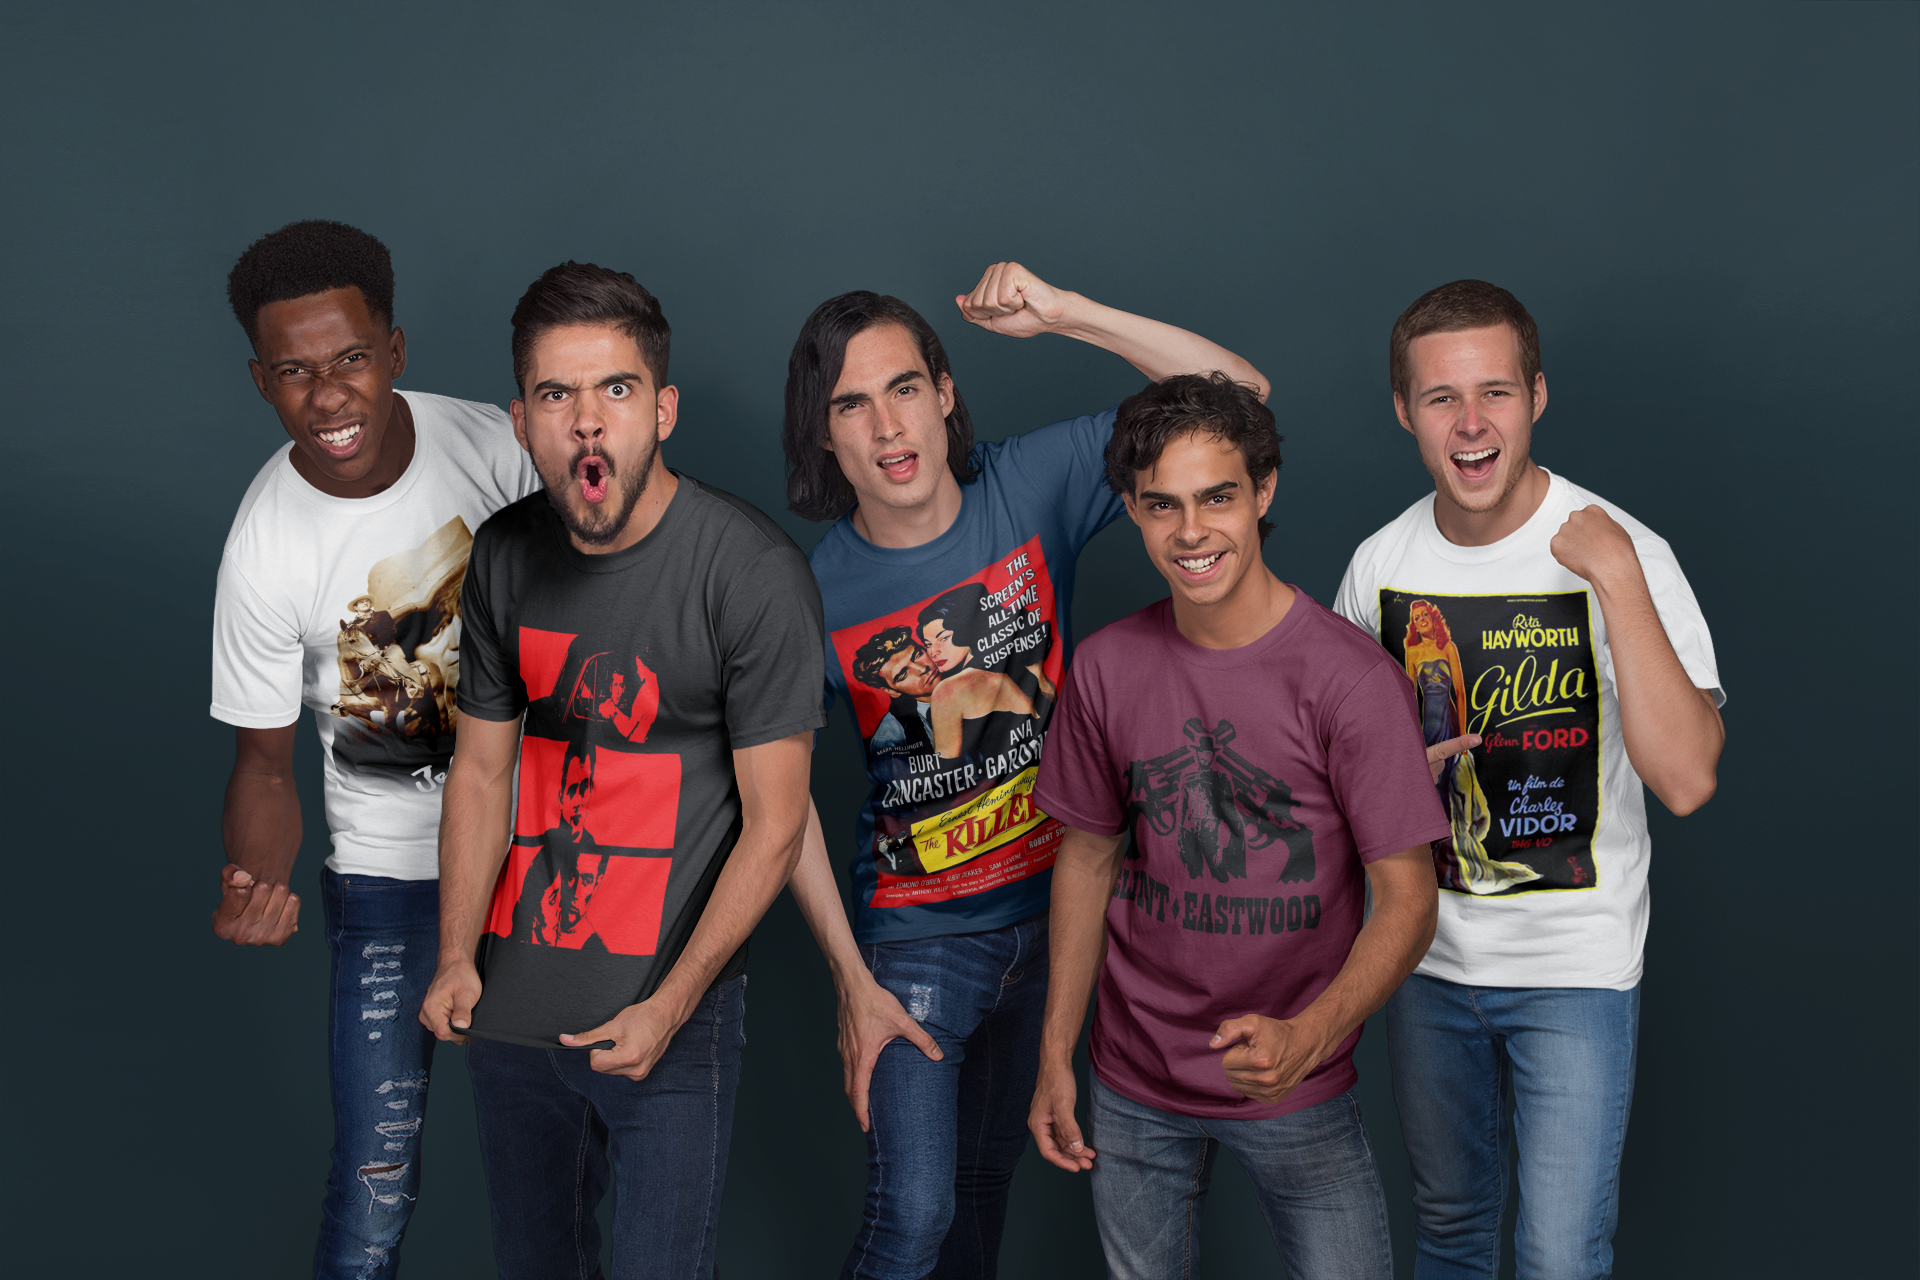 slightlydangerousco t shirts 4